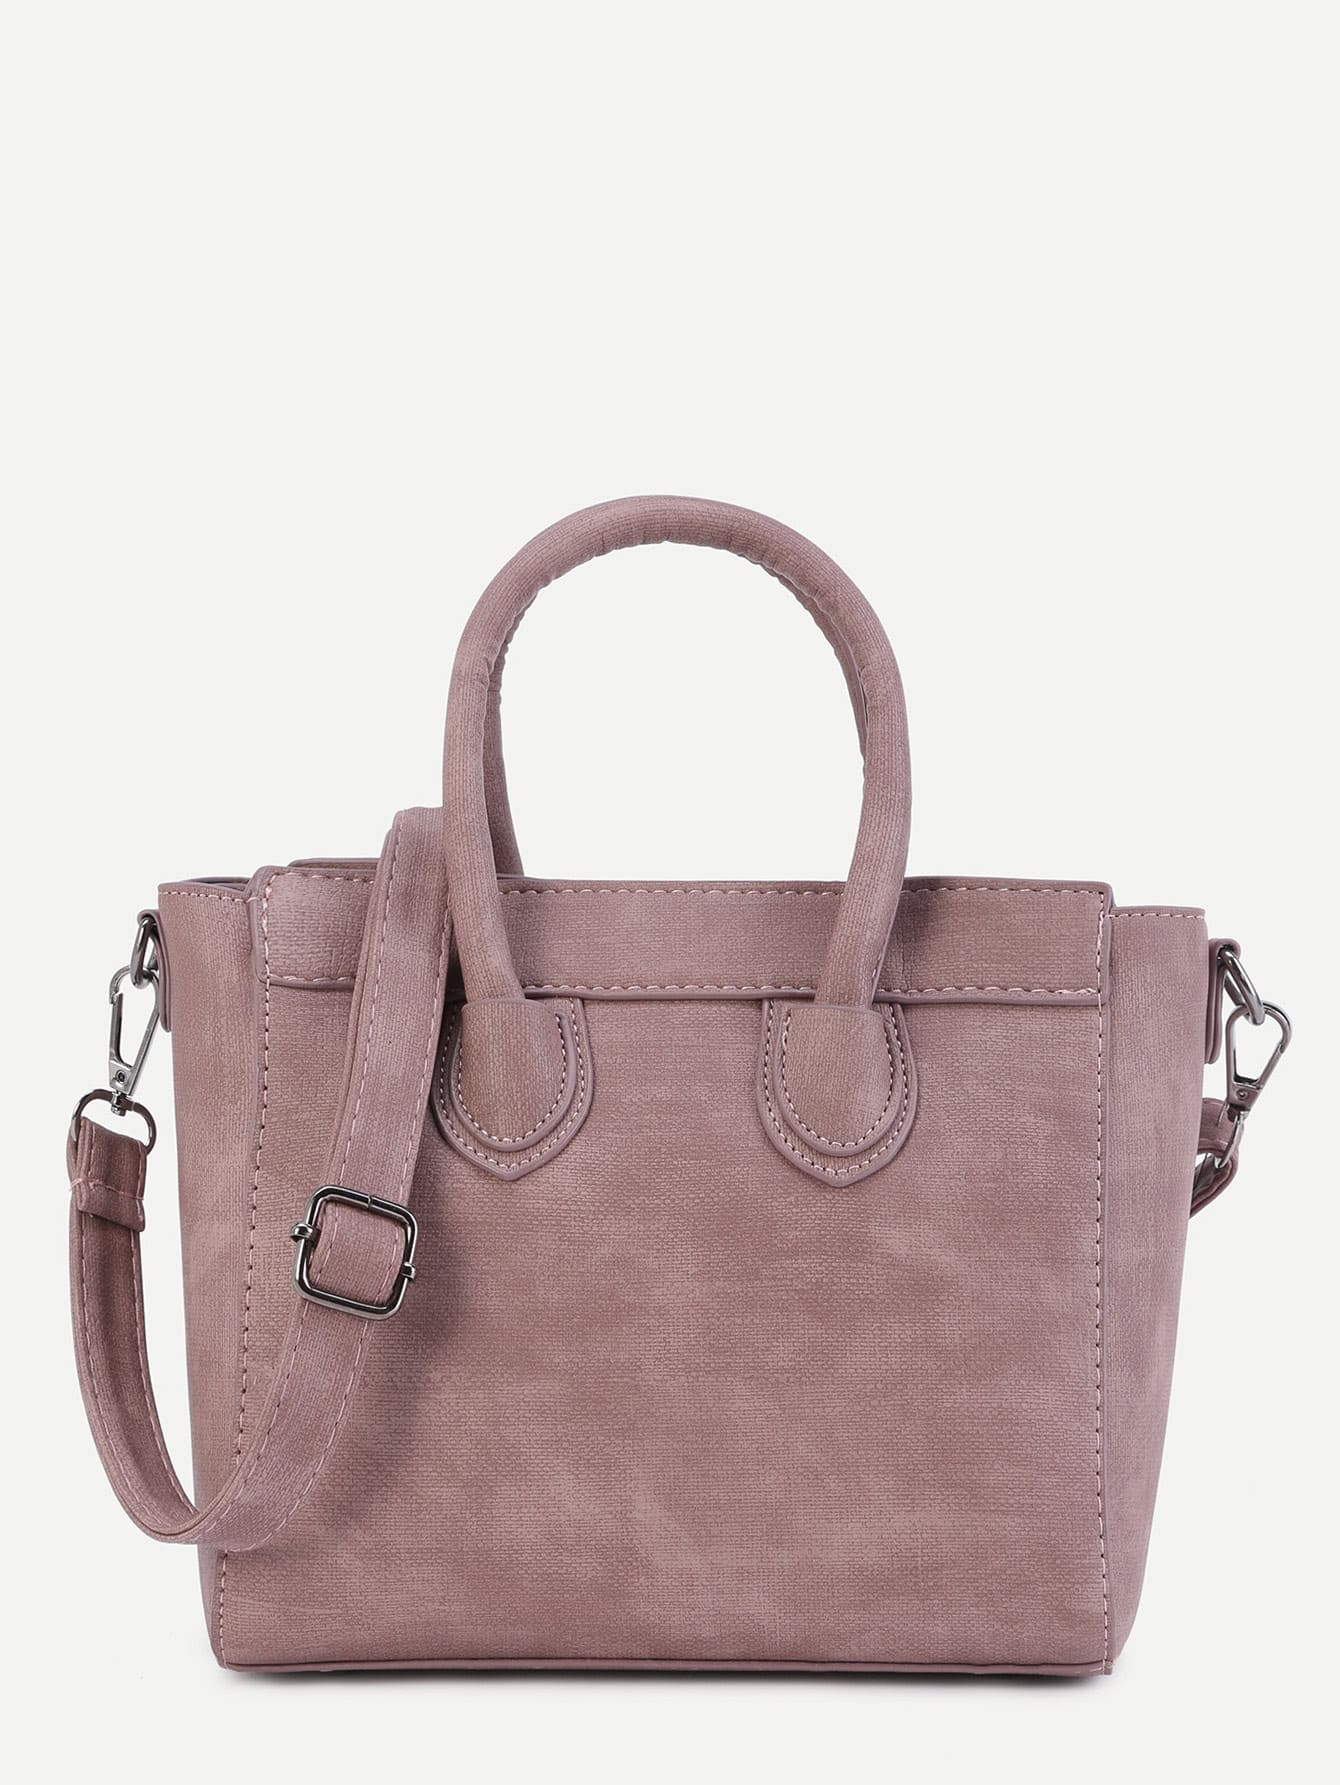 bag161011905_2